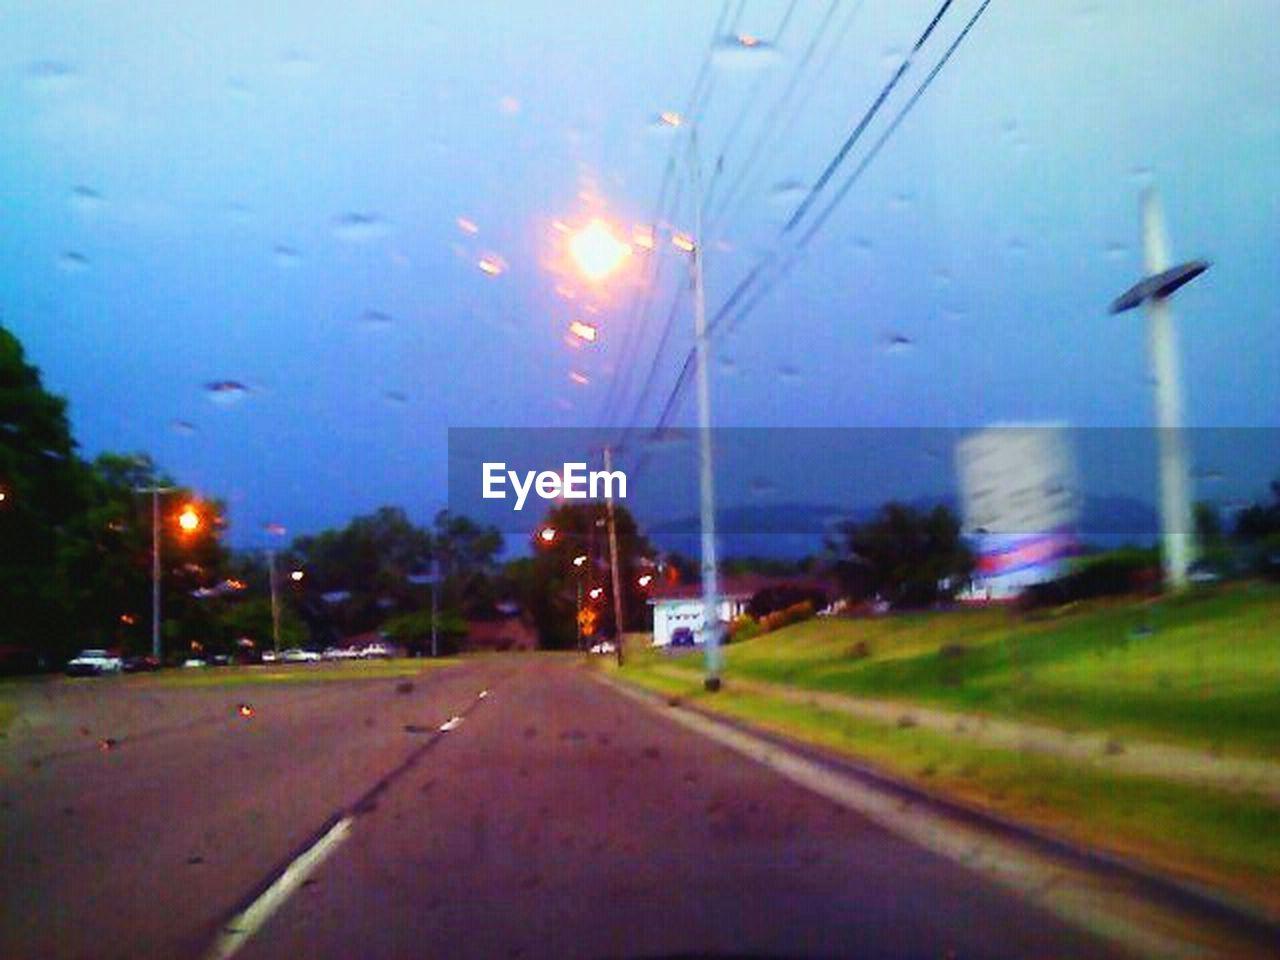 transportation, road, car, illuminated, no people, street, street light, land vehicle, night, mode of transport, sky, outdoors, the way forward, grass, nature